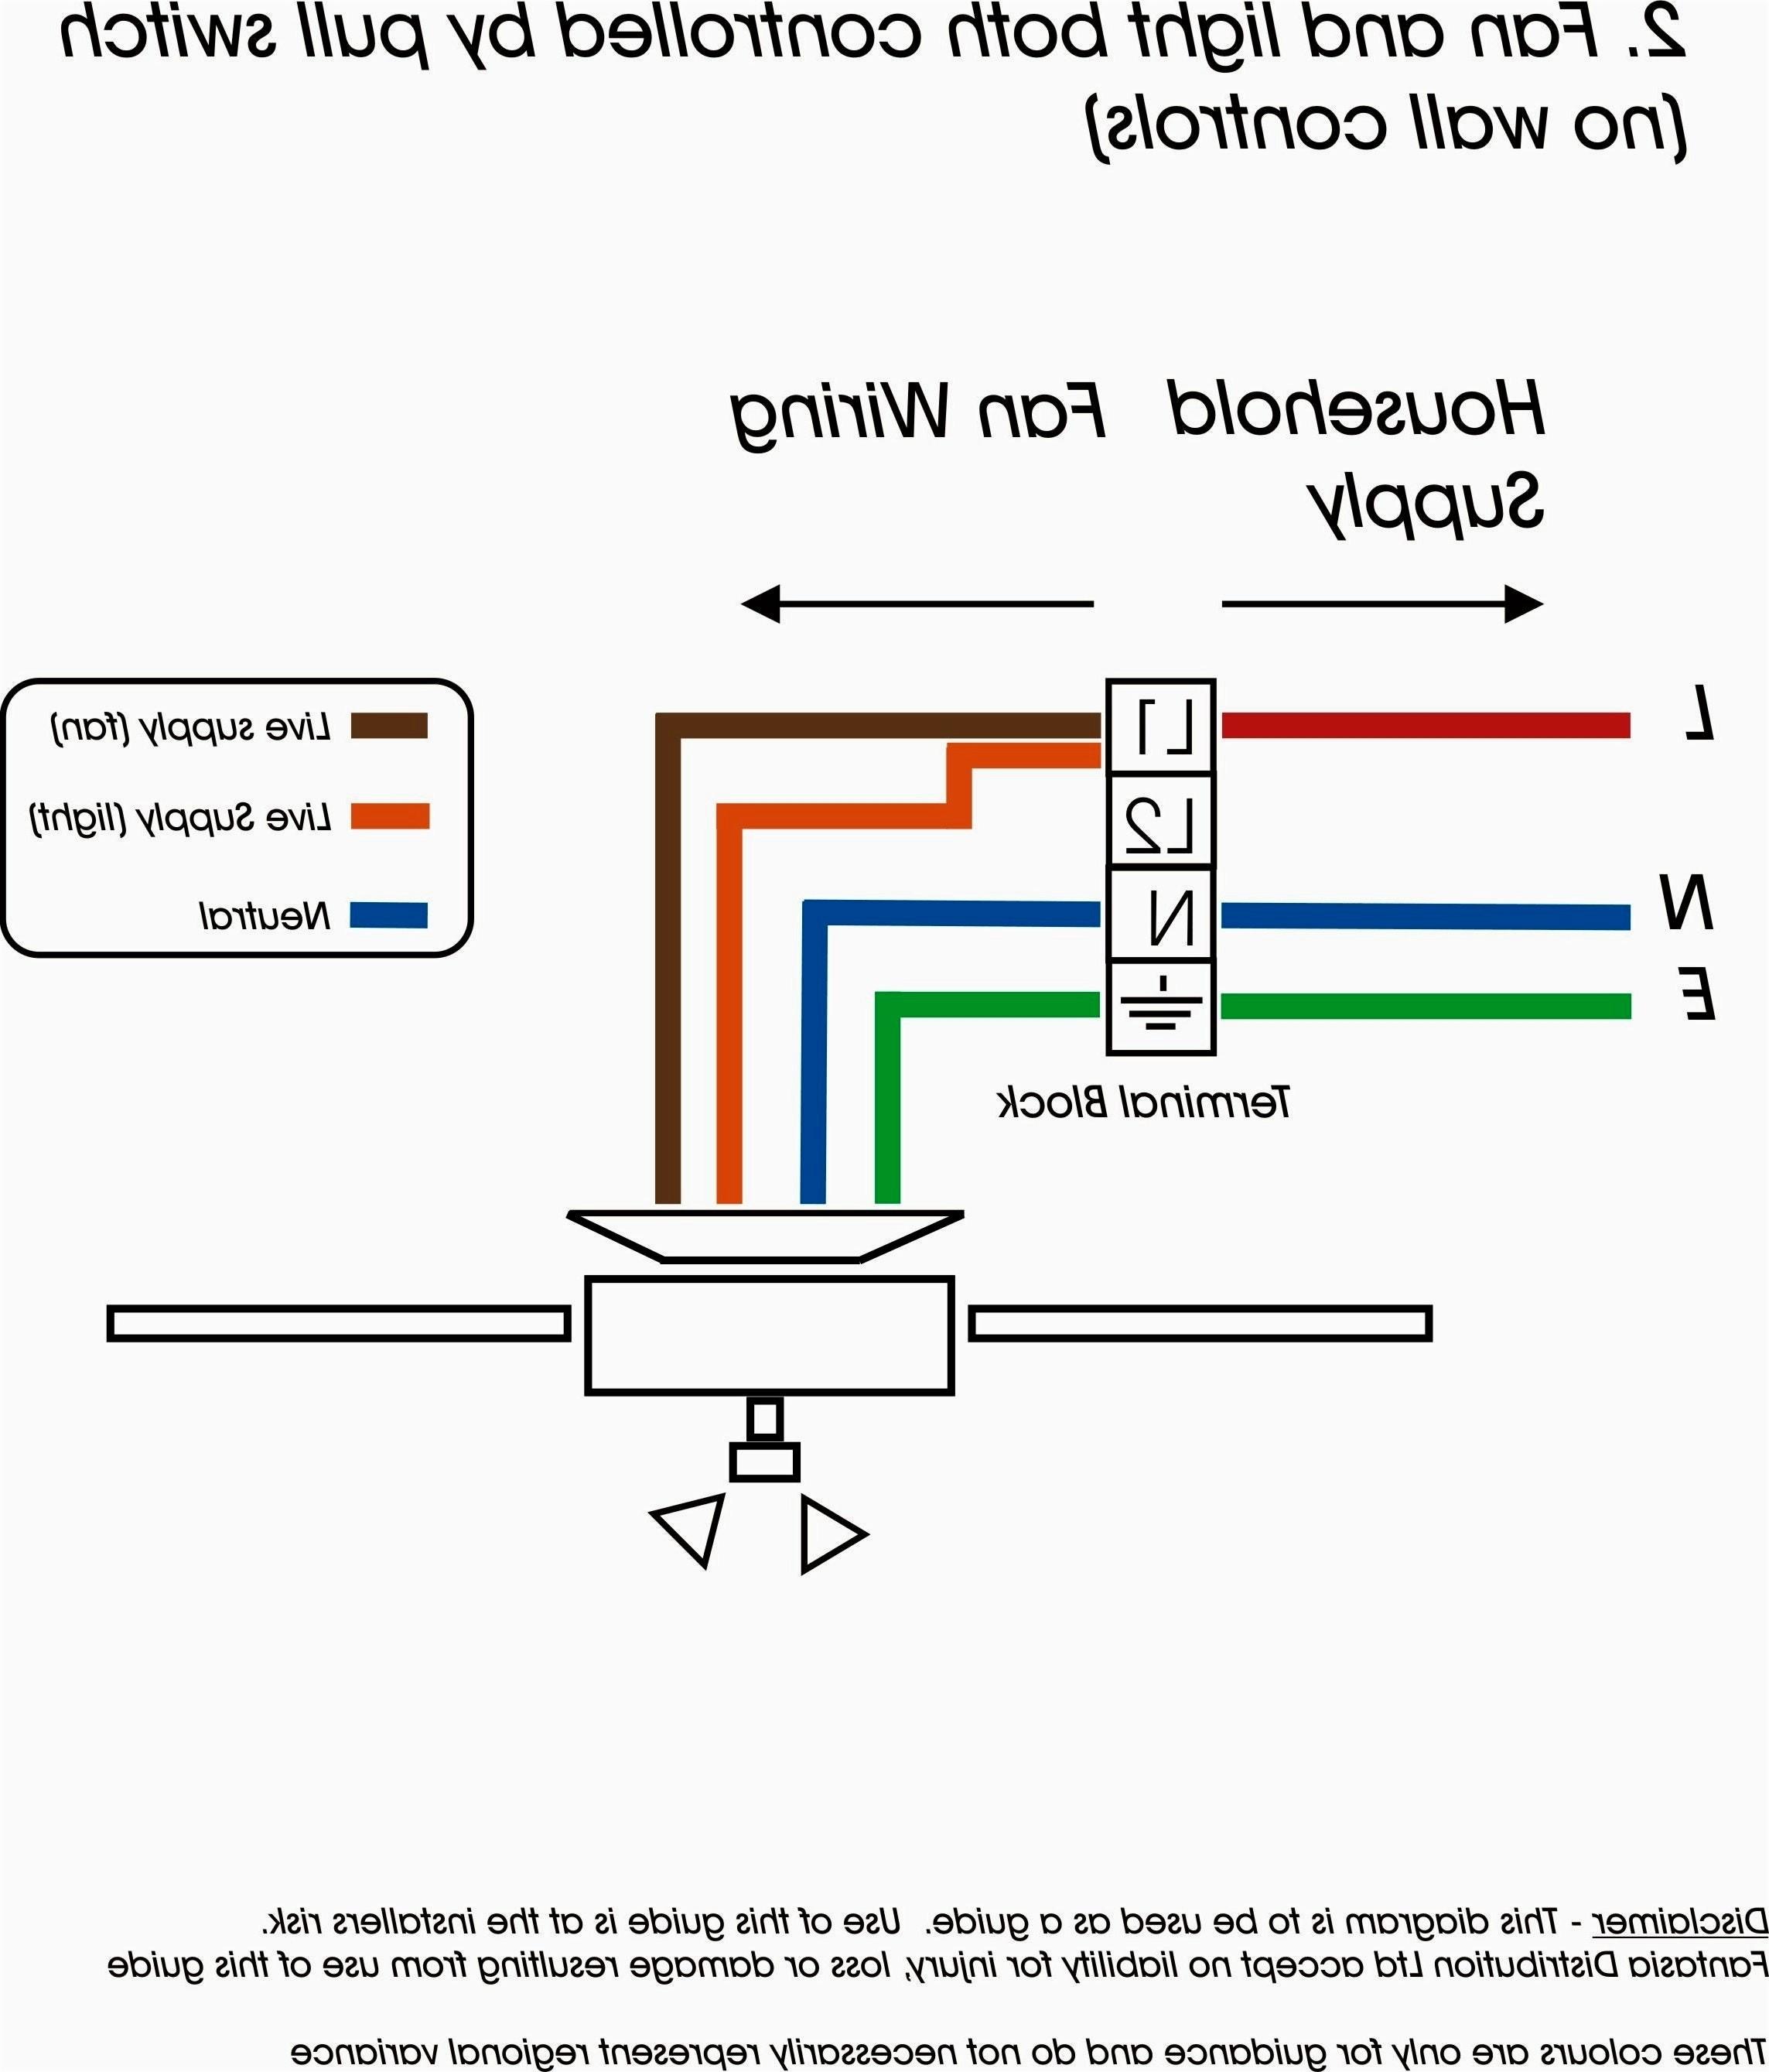 Quorum Ceiling Fan Wiring Diagram : Pro armor sound bar wiring diagram free